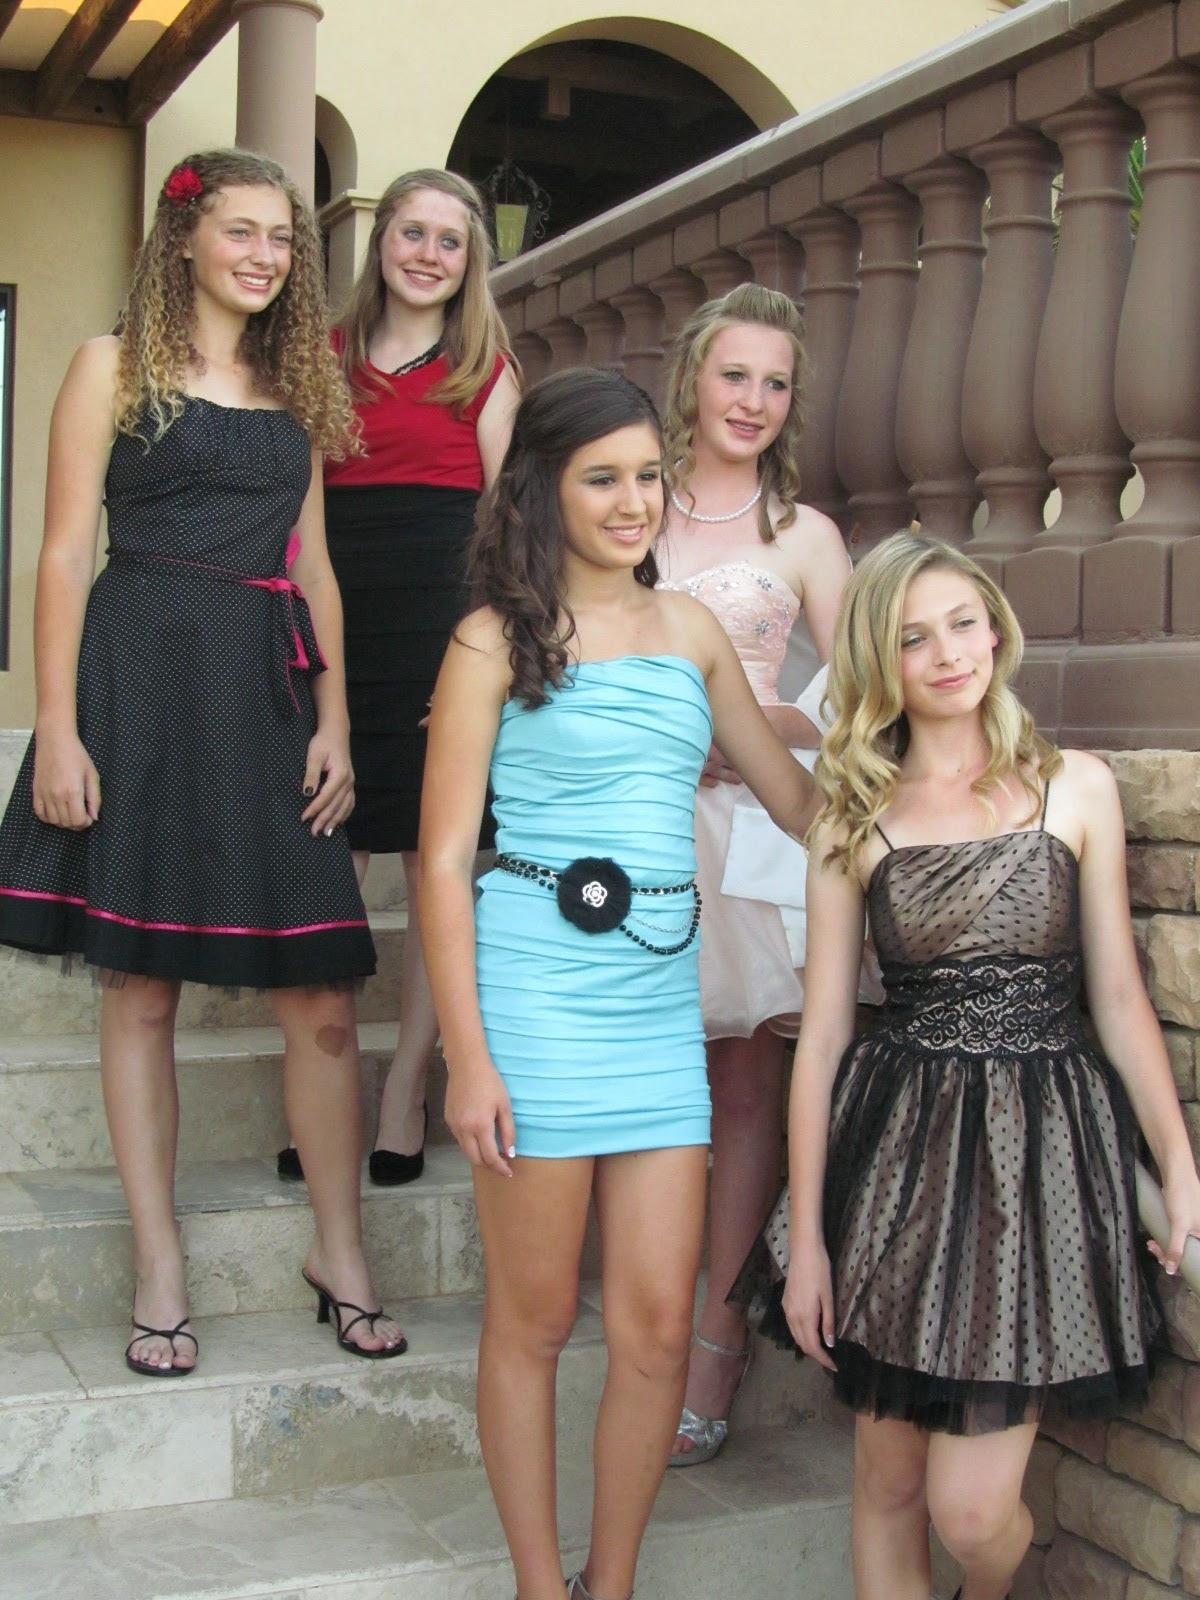 b2327f2741a My6kiddos Myranda 39s 8th Grade Formal · Brilliant Ideas Of Perfect Prom  Dresses For 8th Graders